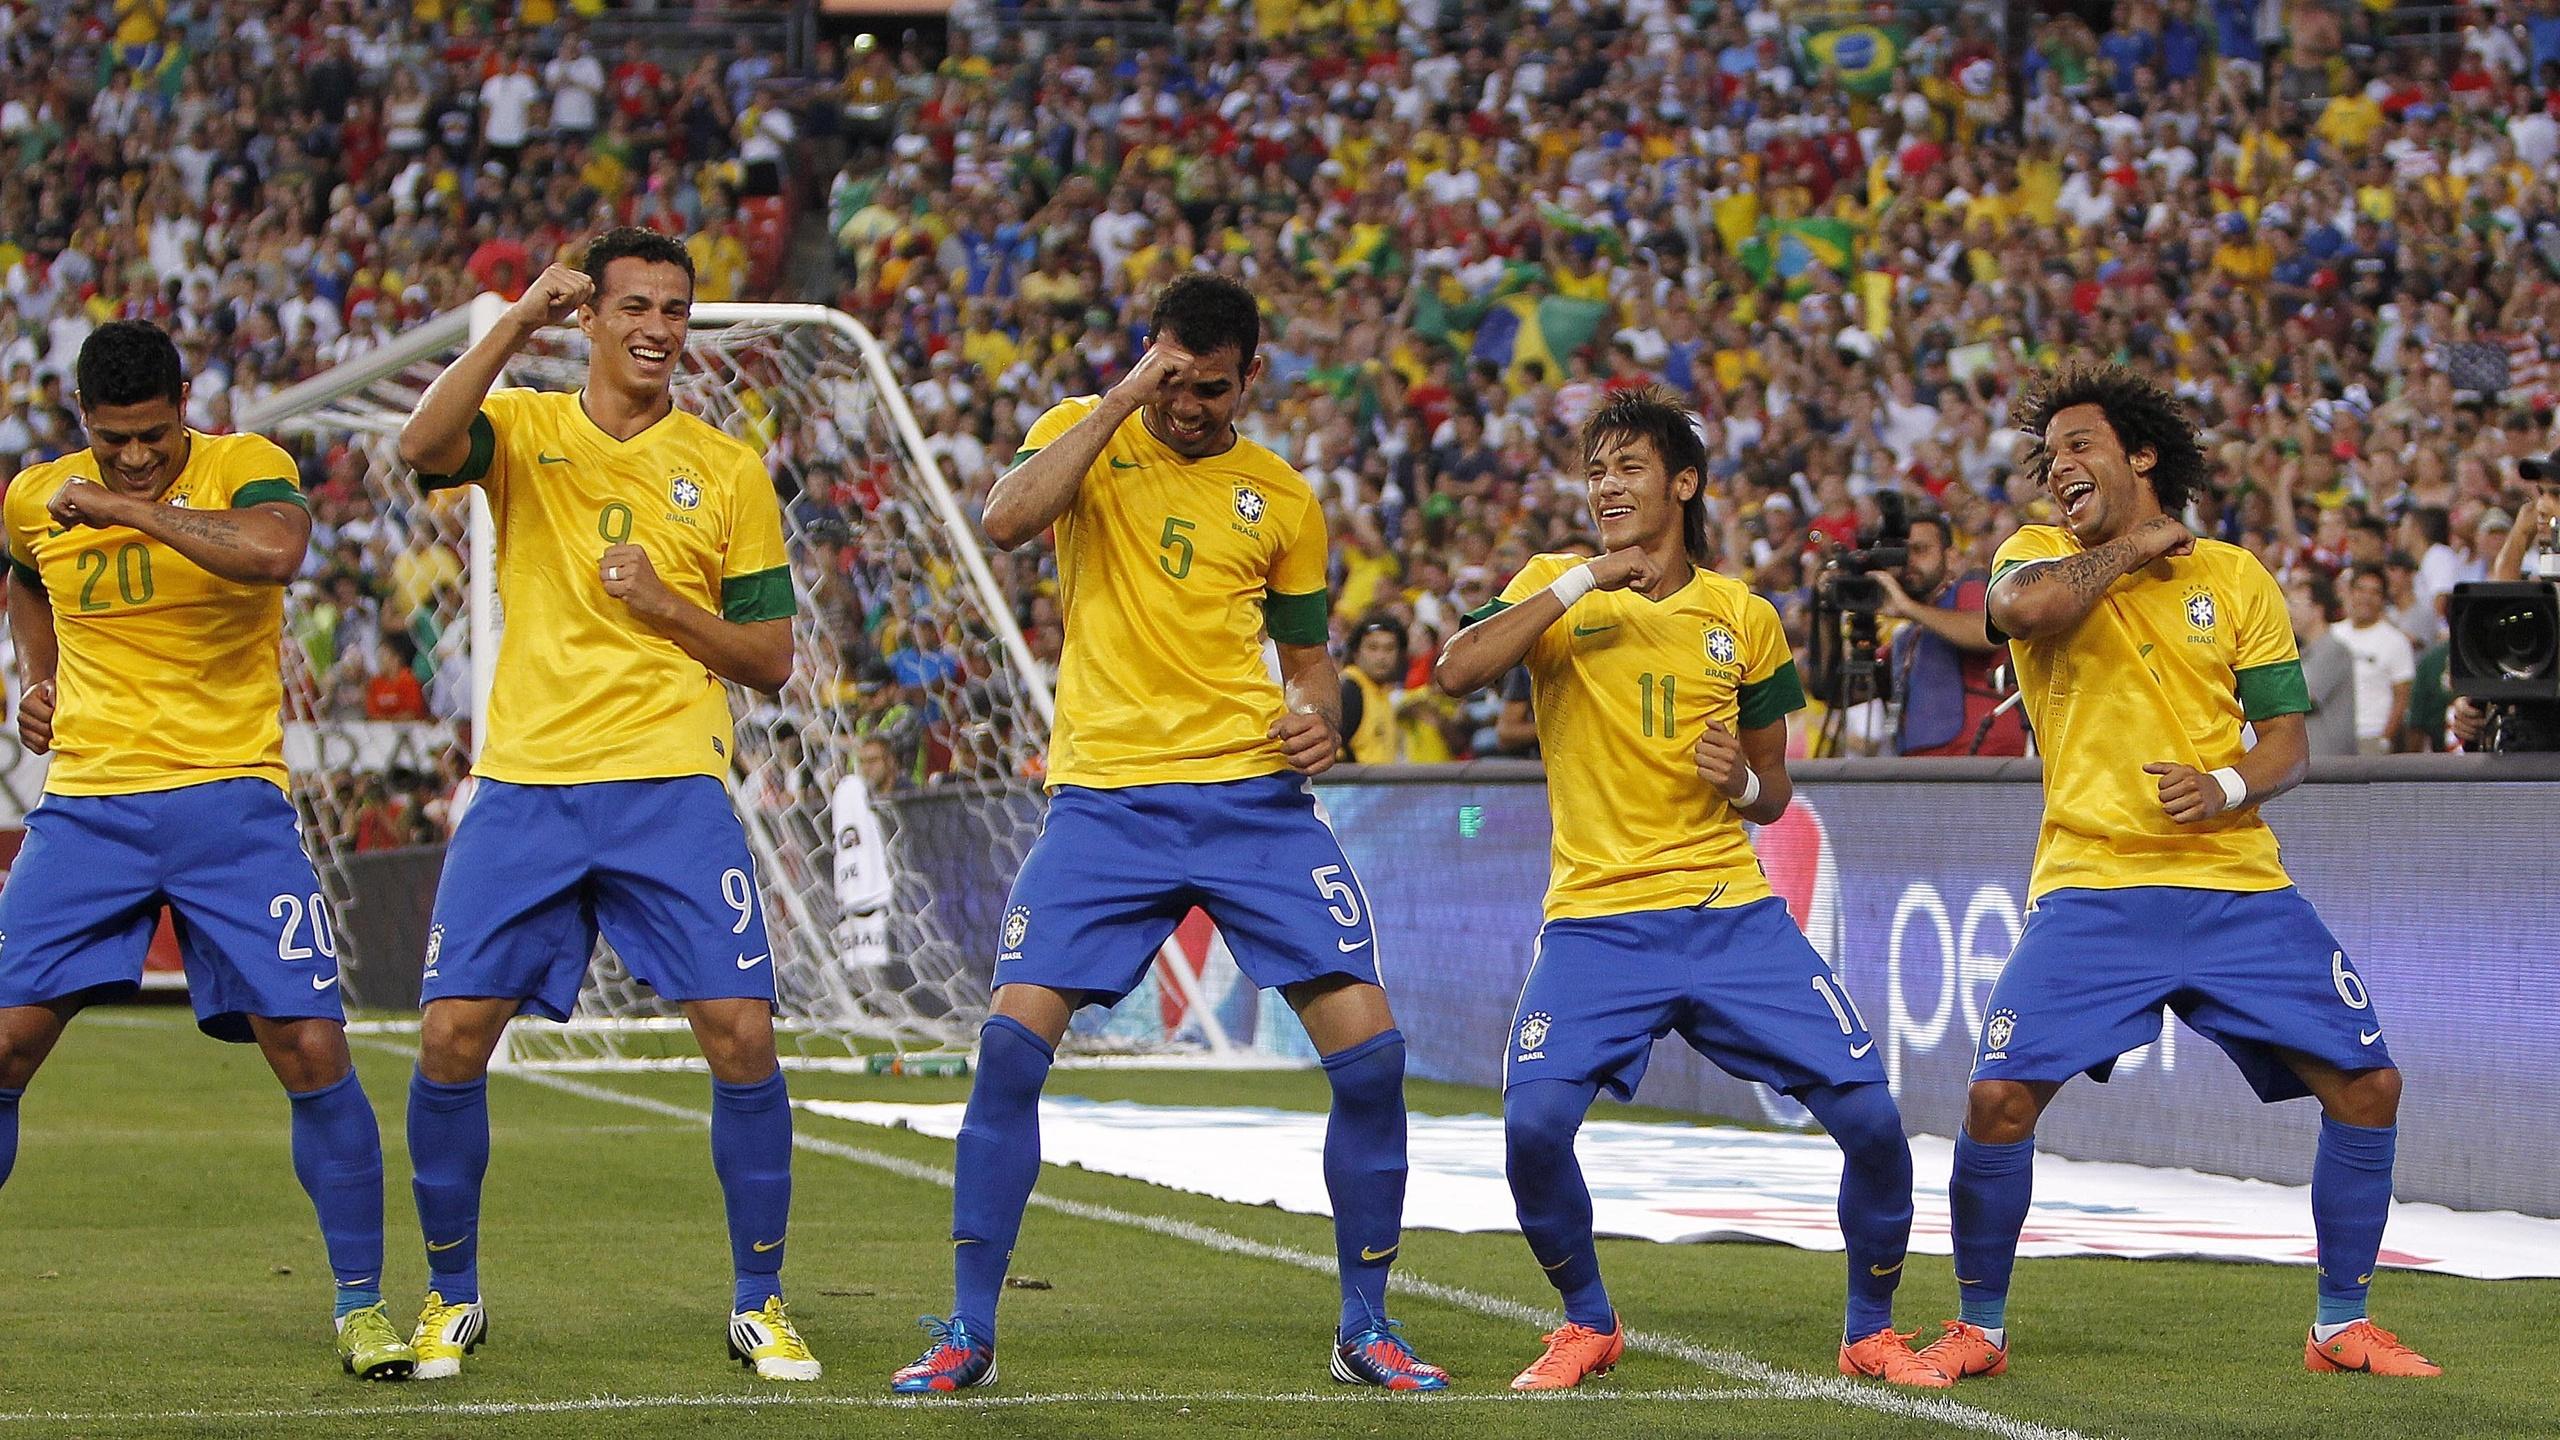 футбол, бразилия, поле